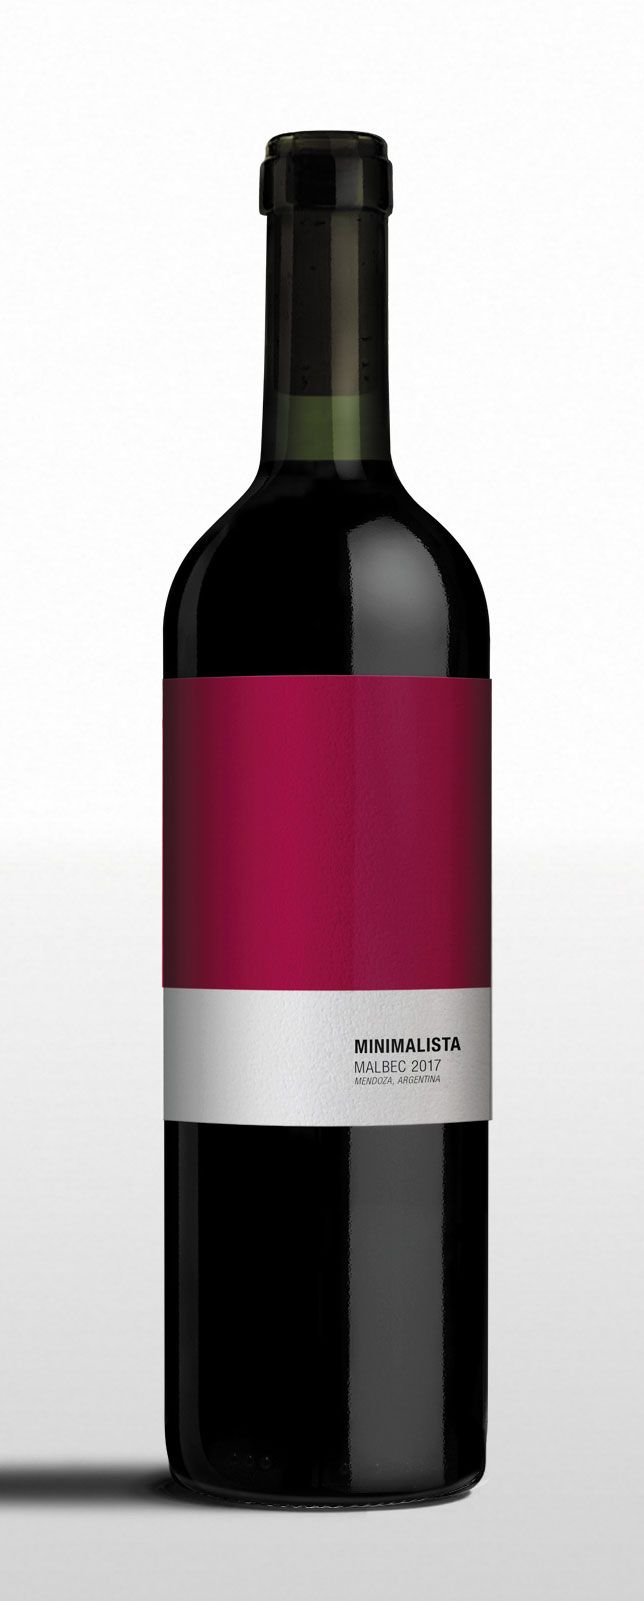 Minimalista Malbec Wine Wineconcept Brandconcept Packaging Winelabel Design Minimalist Abstract Purism Colors Wine Bottle Malbec Wine Wine Design